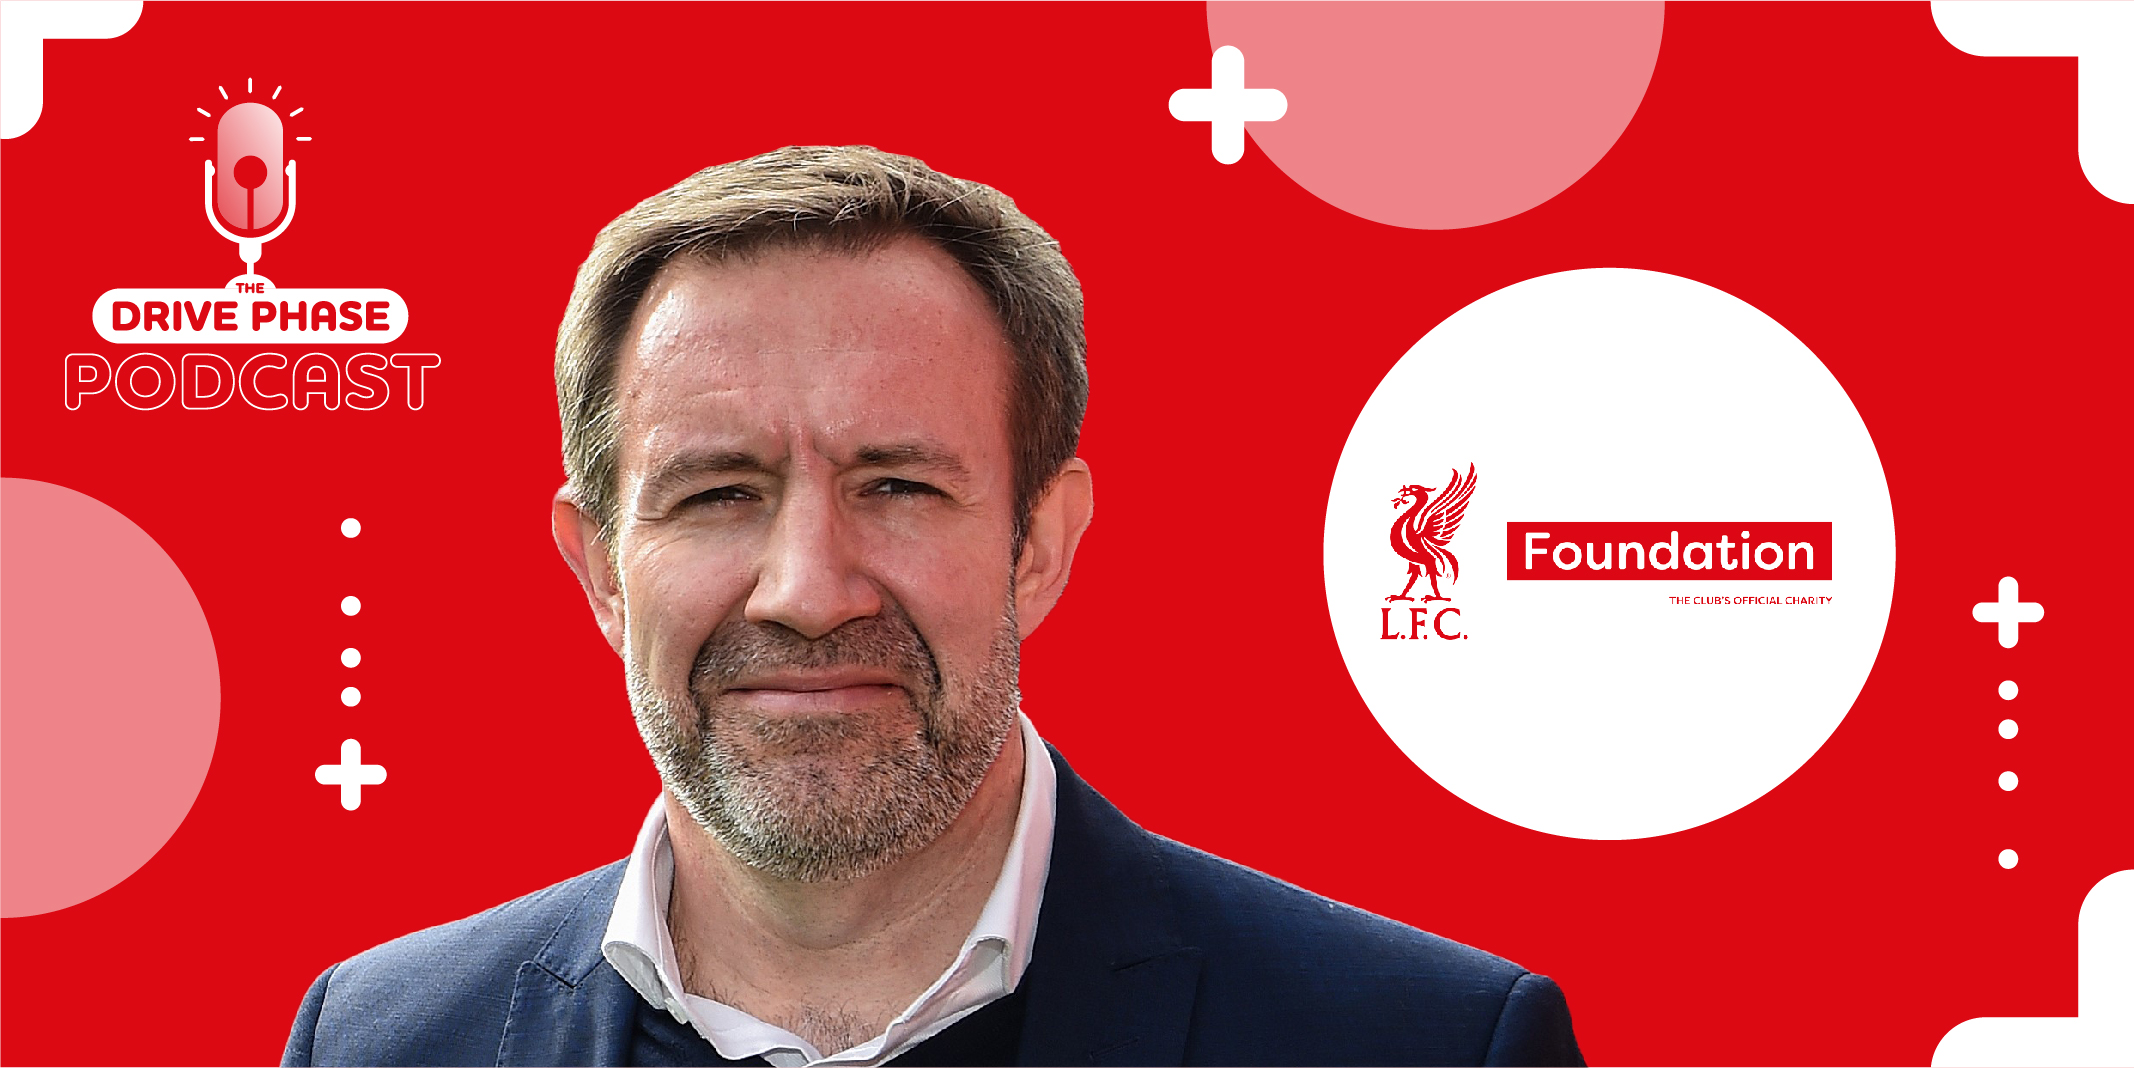 Liverpool FC Foundation